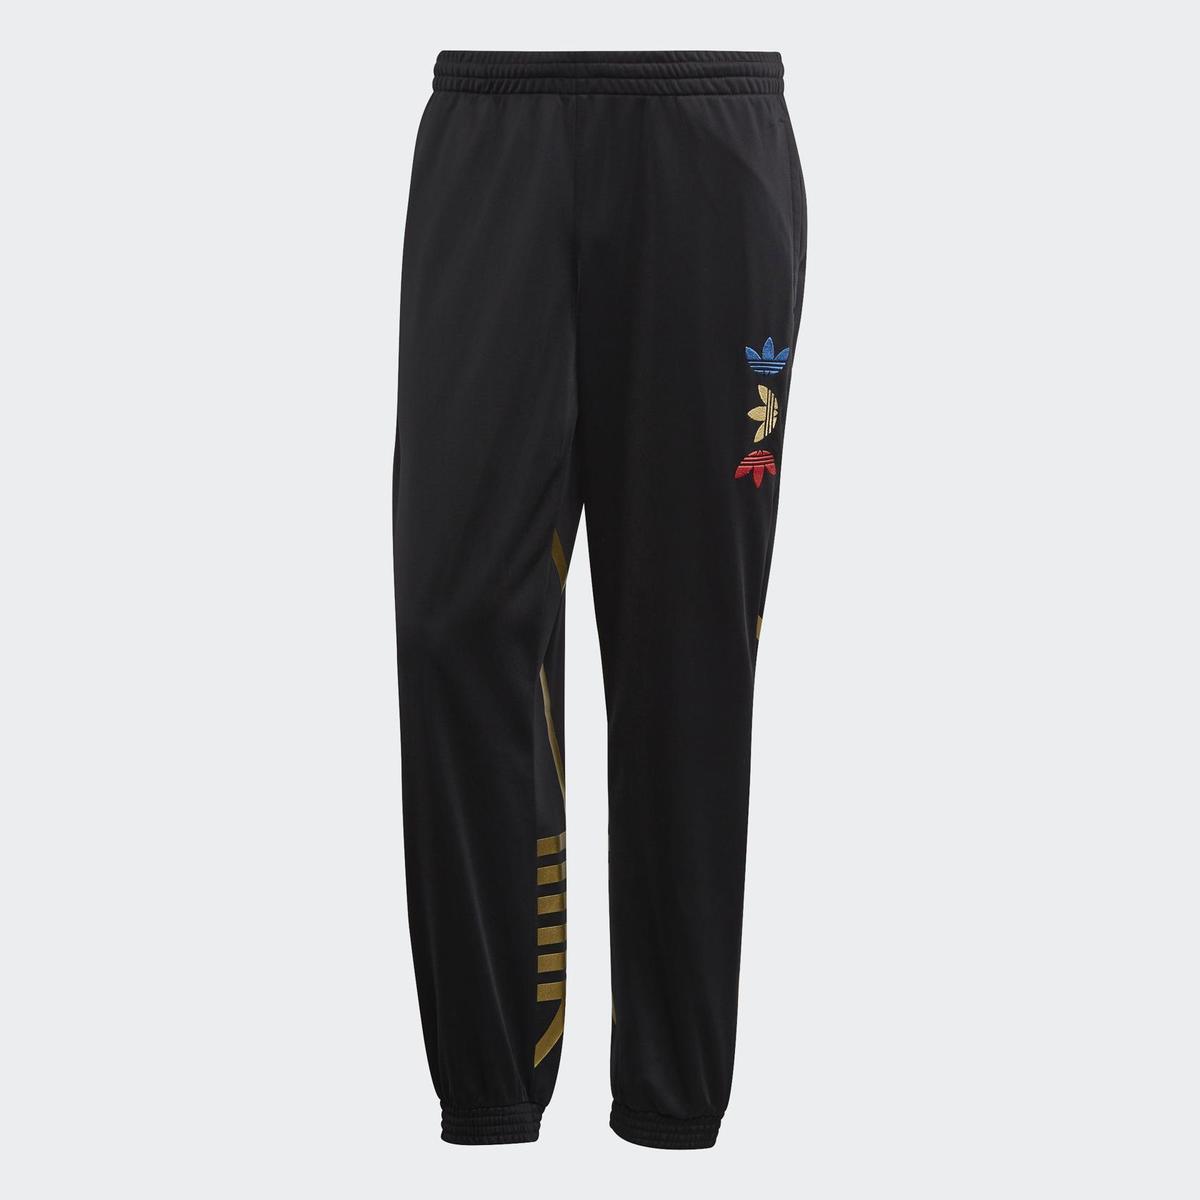 adidas Originals男款運動褲。NT$2,890(adidas Originals提供)